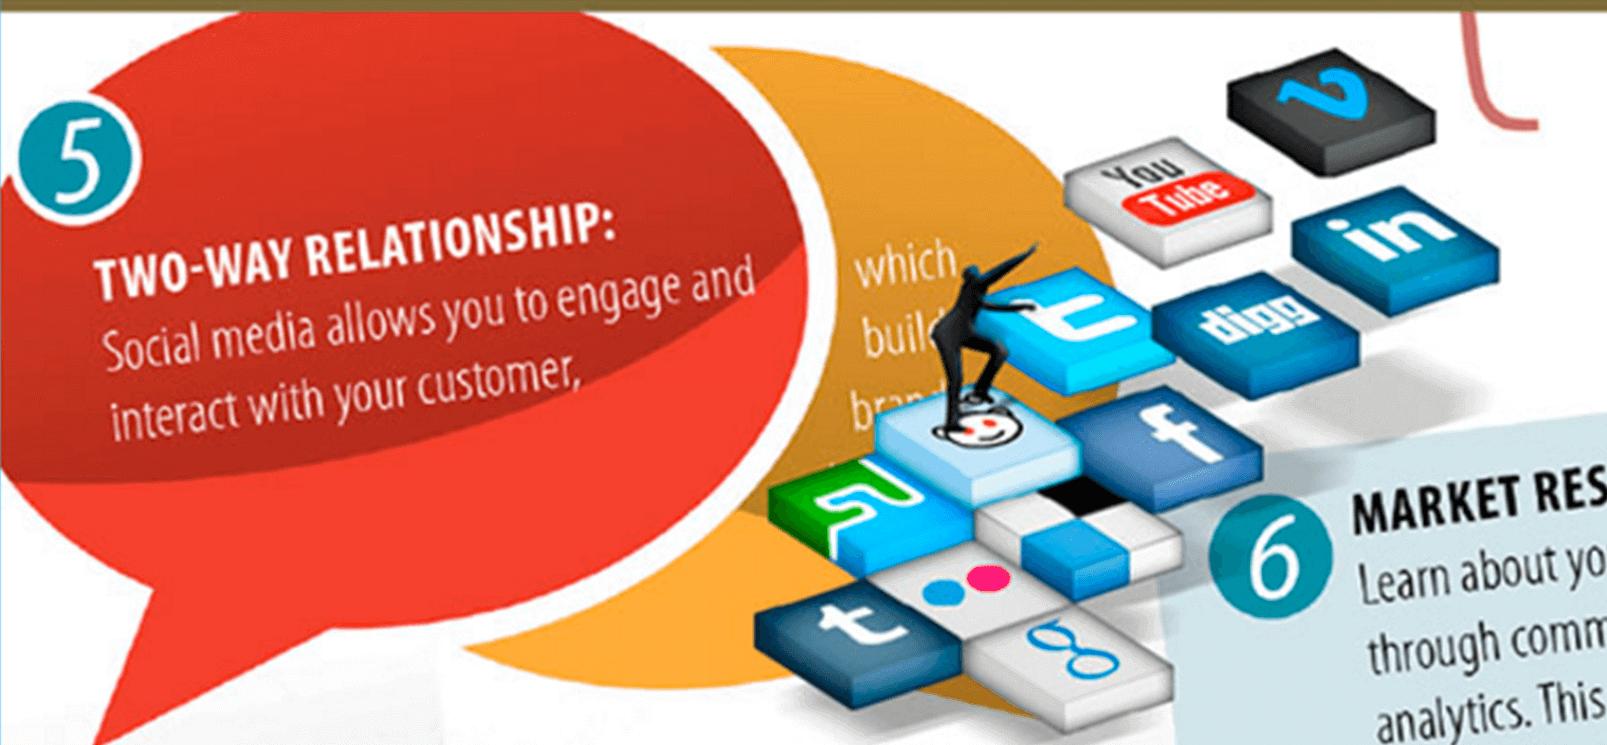 Seven Ways Social Media Benefits Leaders In The Healtcare Industry